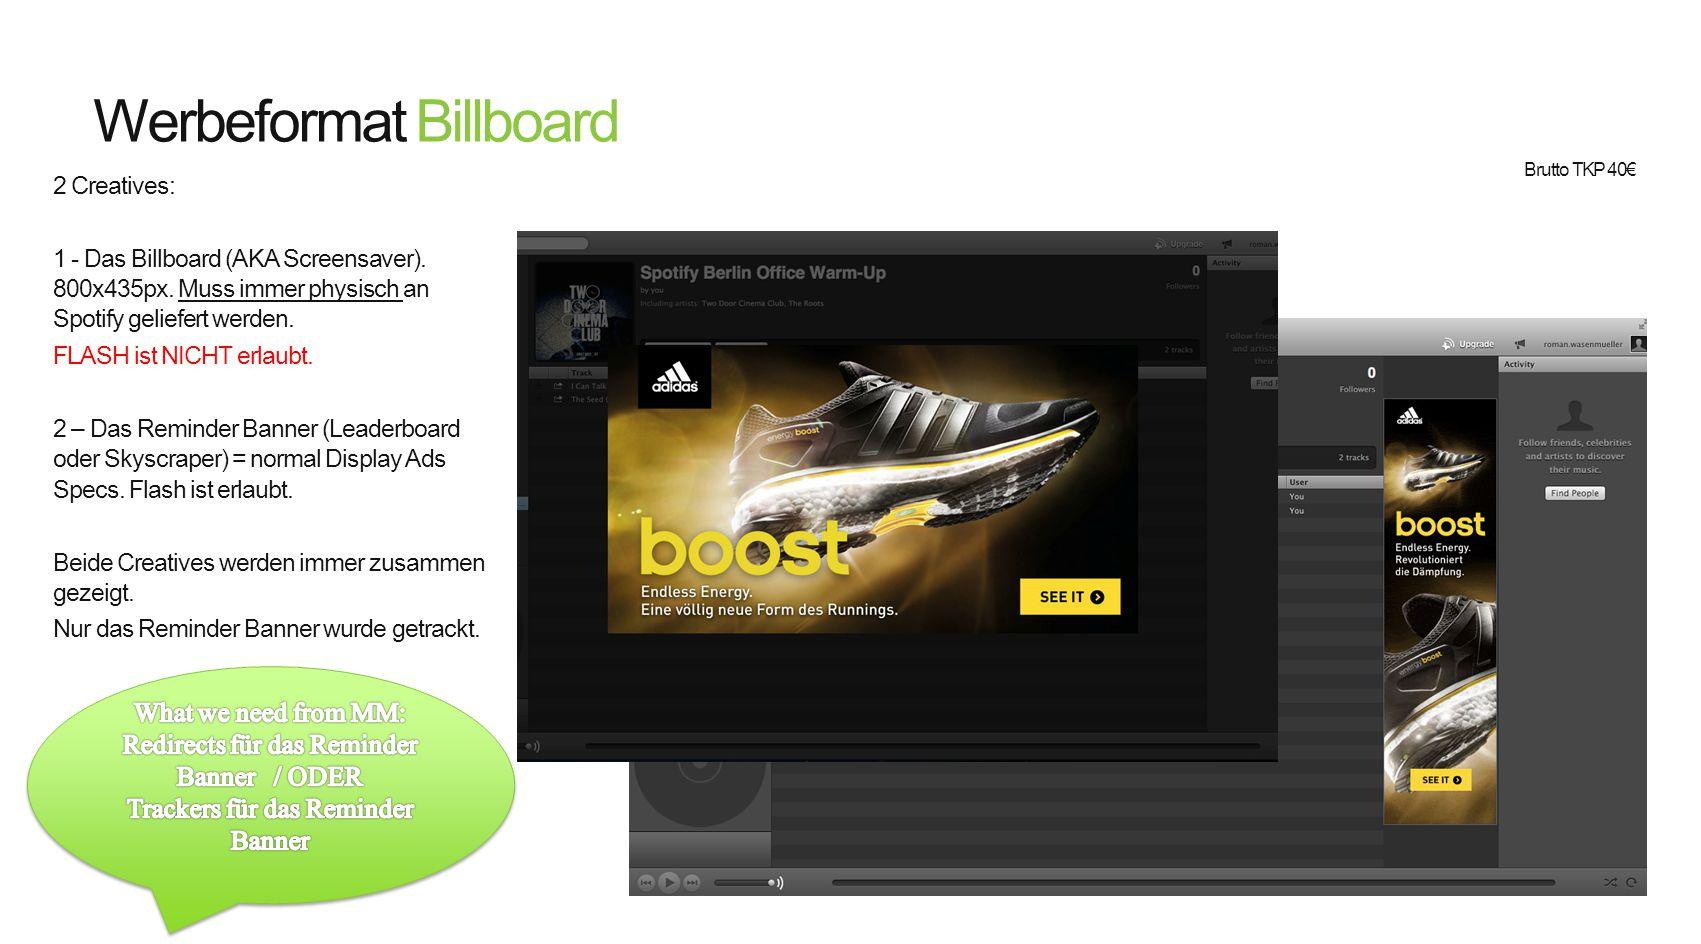 Werbeformat Billboard